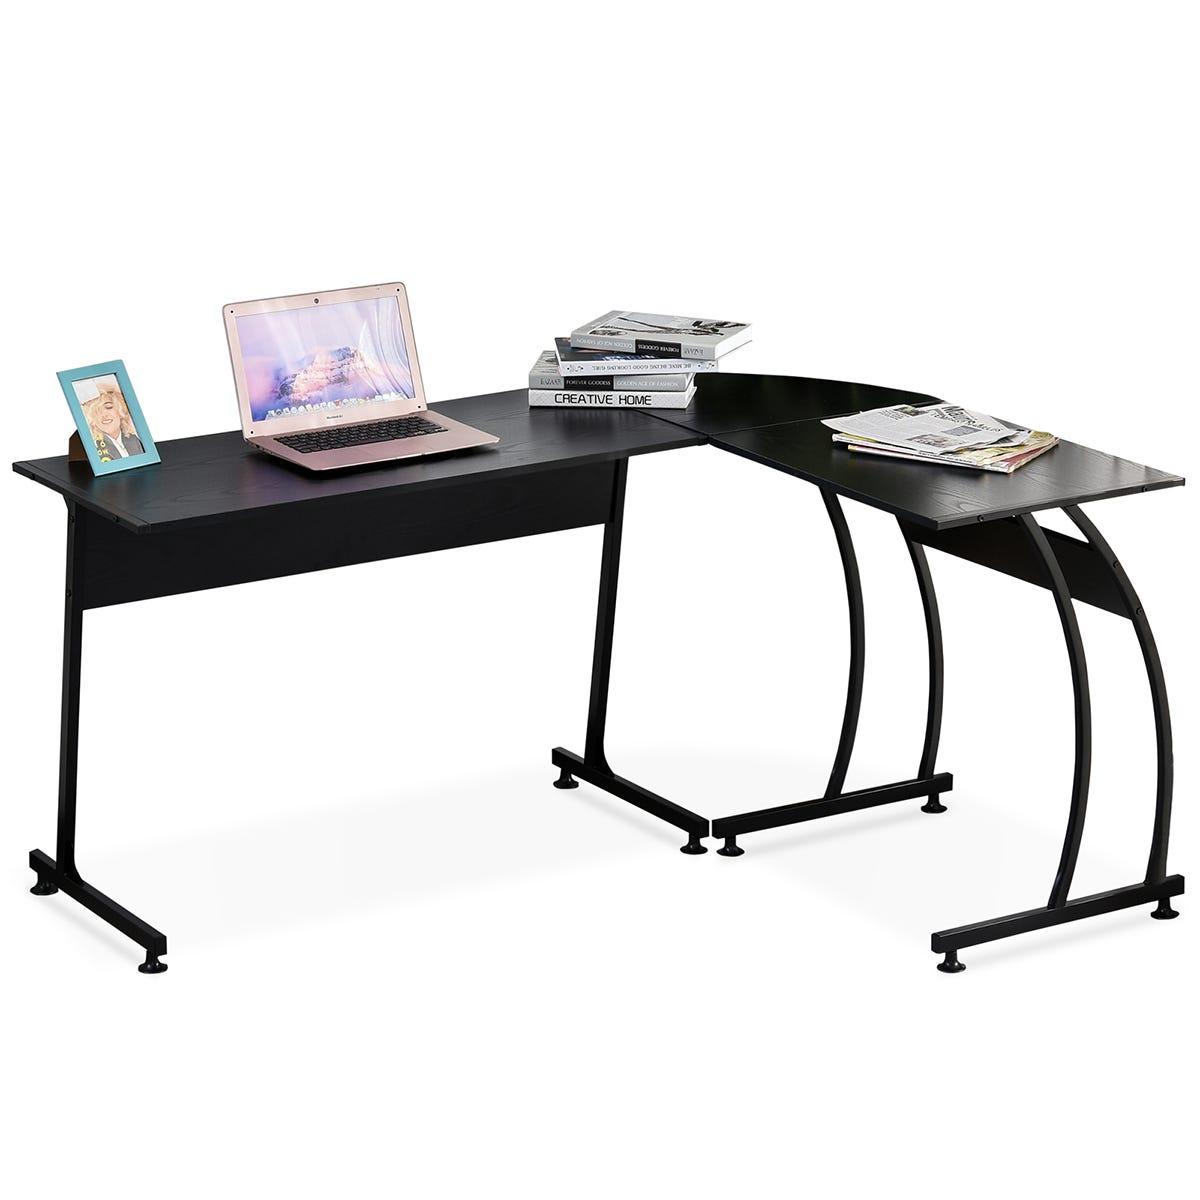 Zennor Roche Gaming L-Shaped Corner Desk with Steel Frame & Adjustable Feet - Black